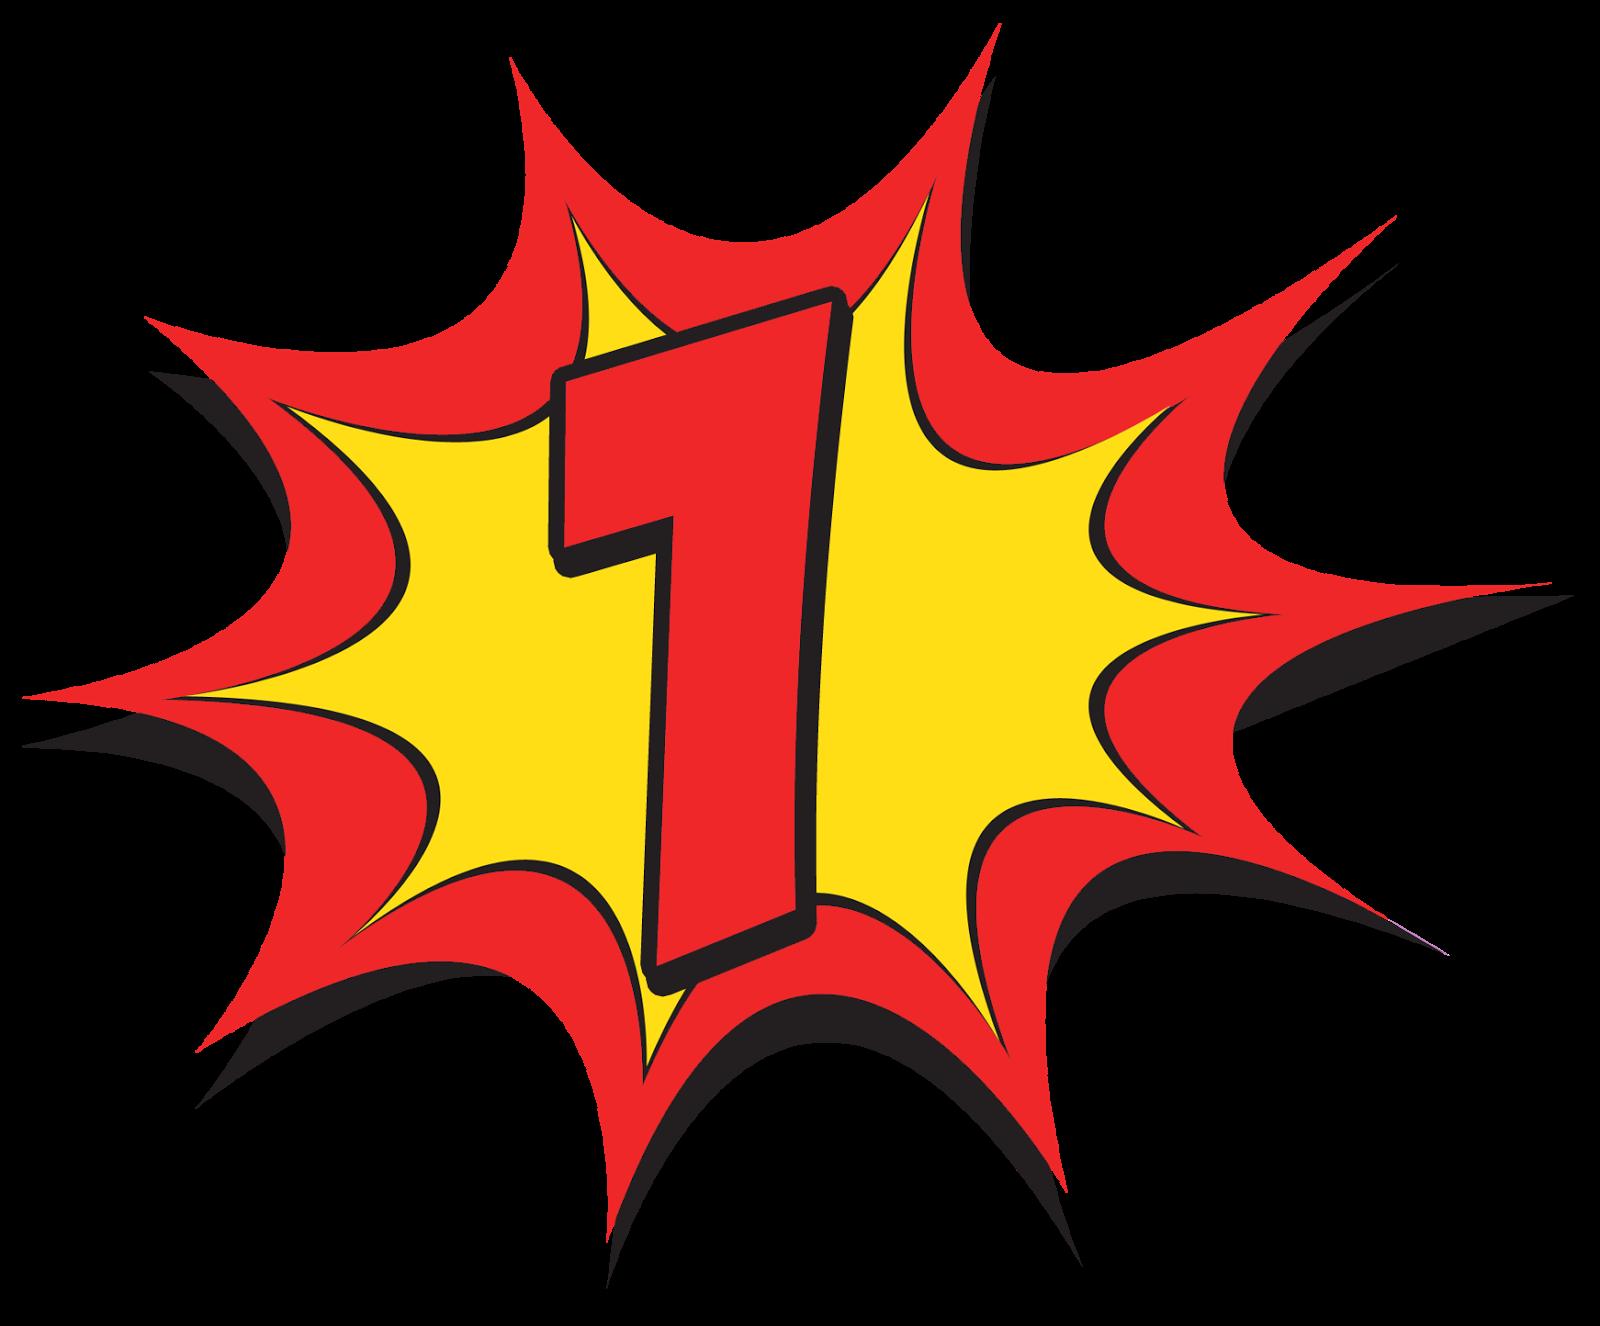 Hero clipart superhero themed. Free cool stuff for